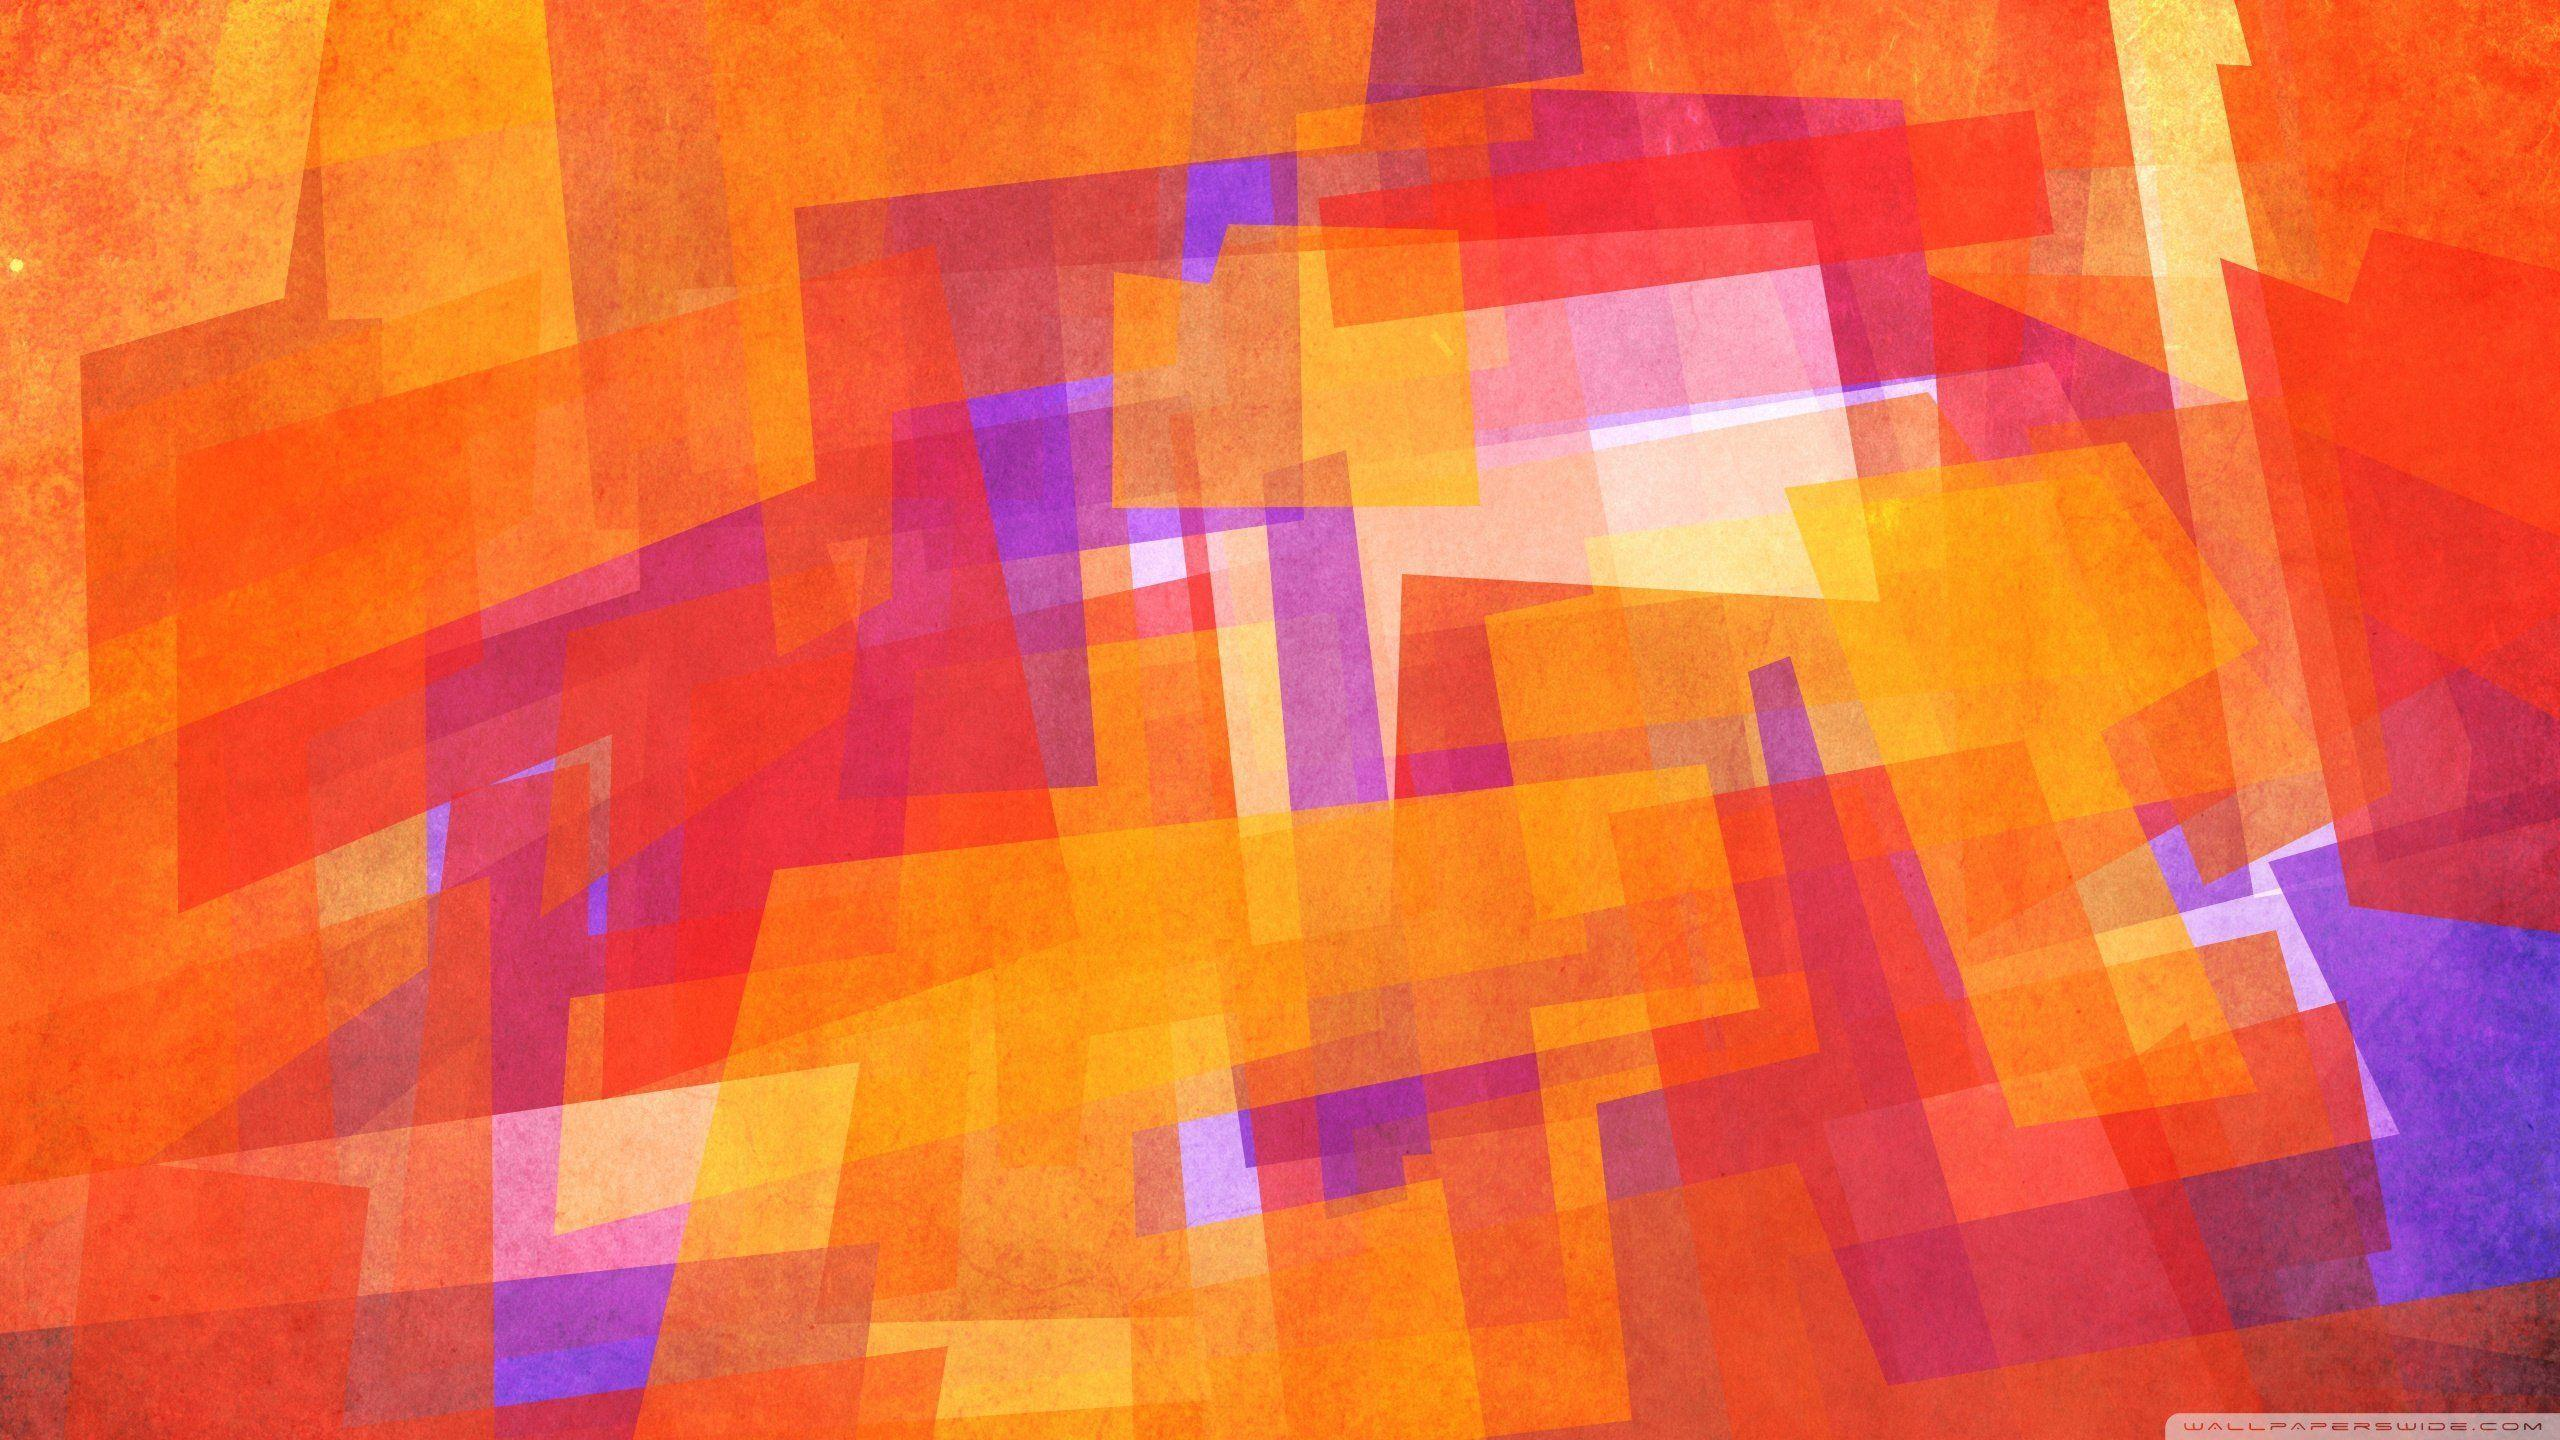 Geometric Wallpaper Hd Wallpaper